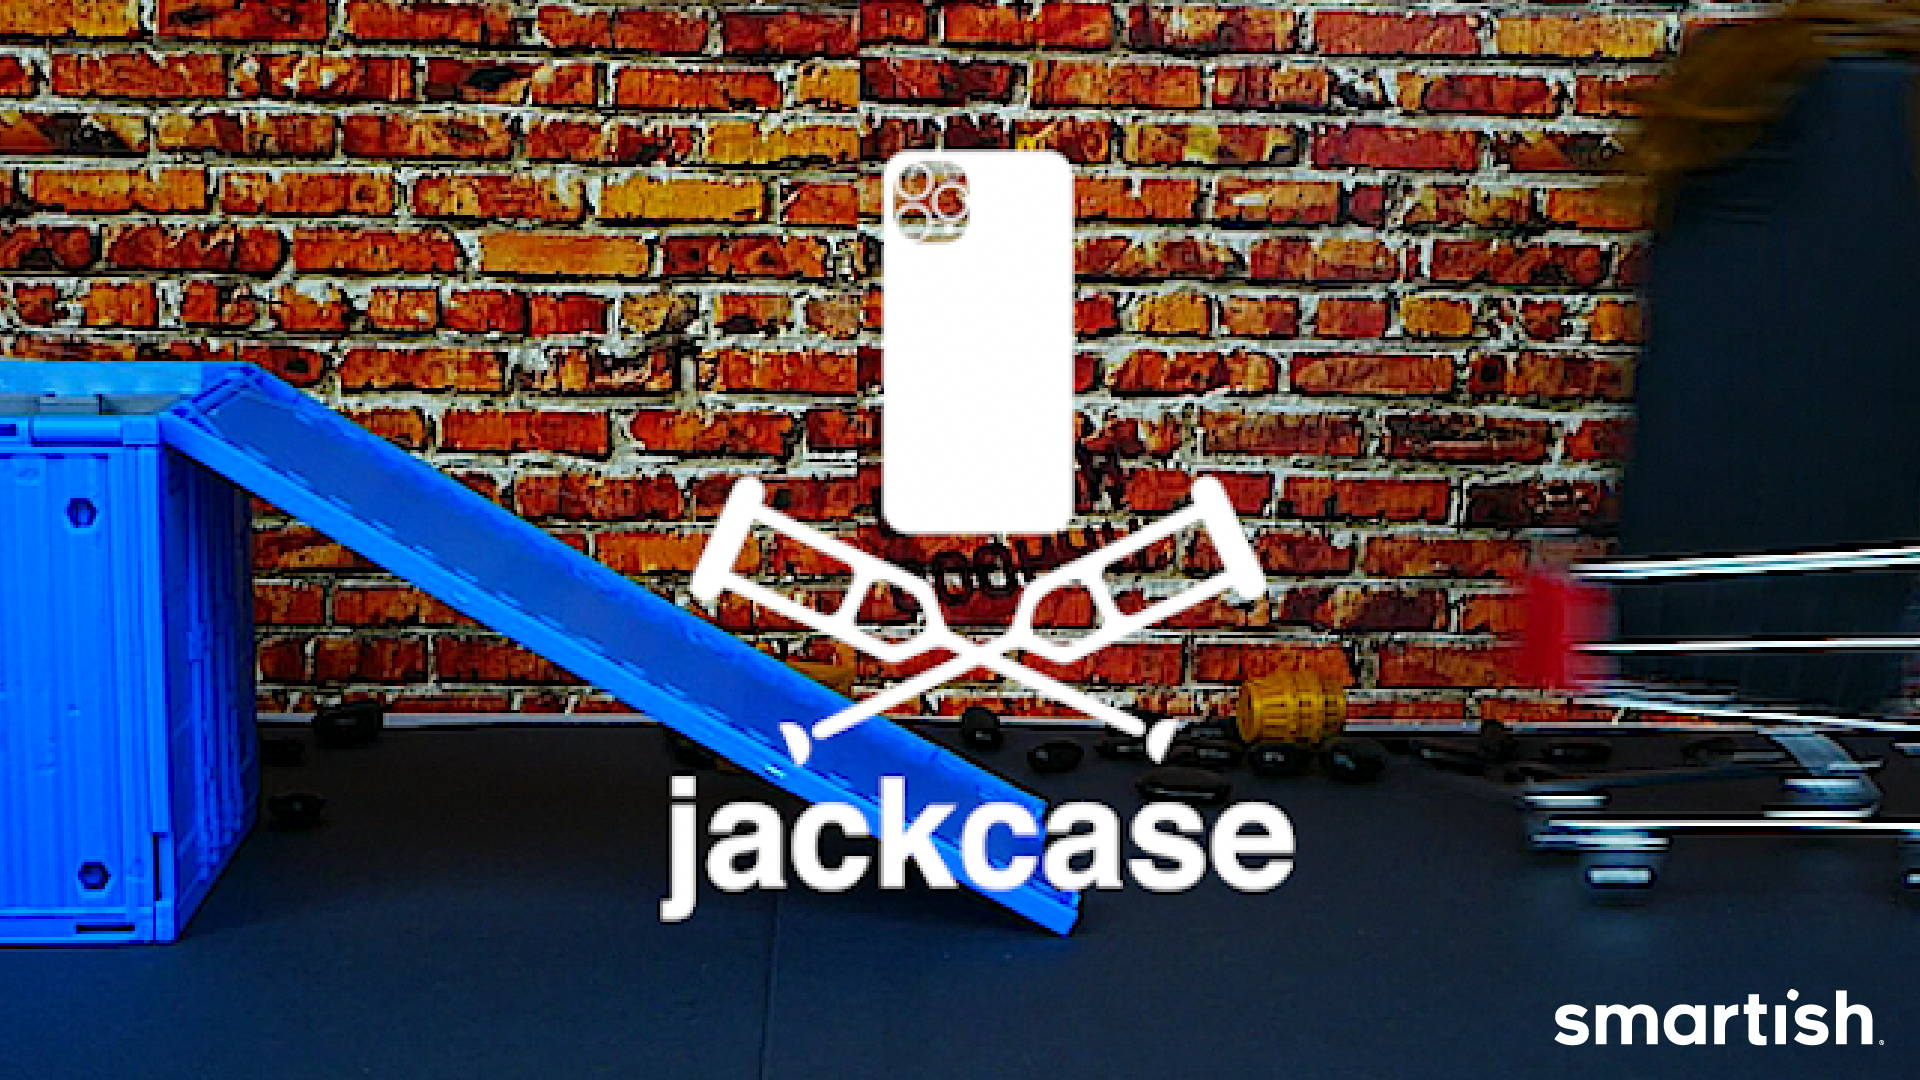 JackCASE - a Smartish Parody (Jackass)